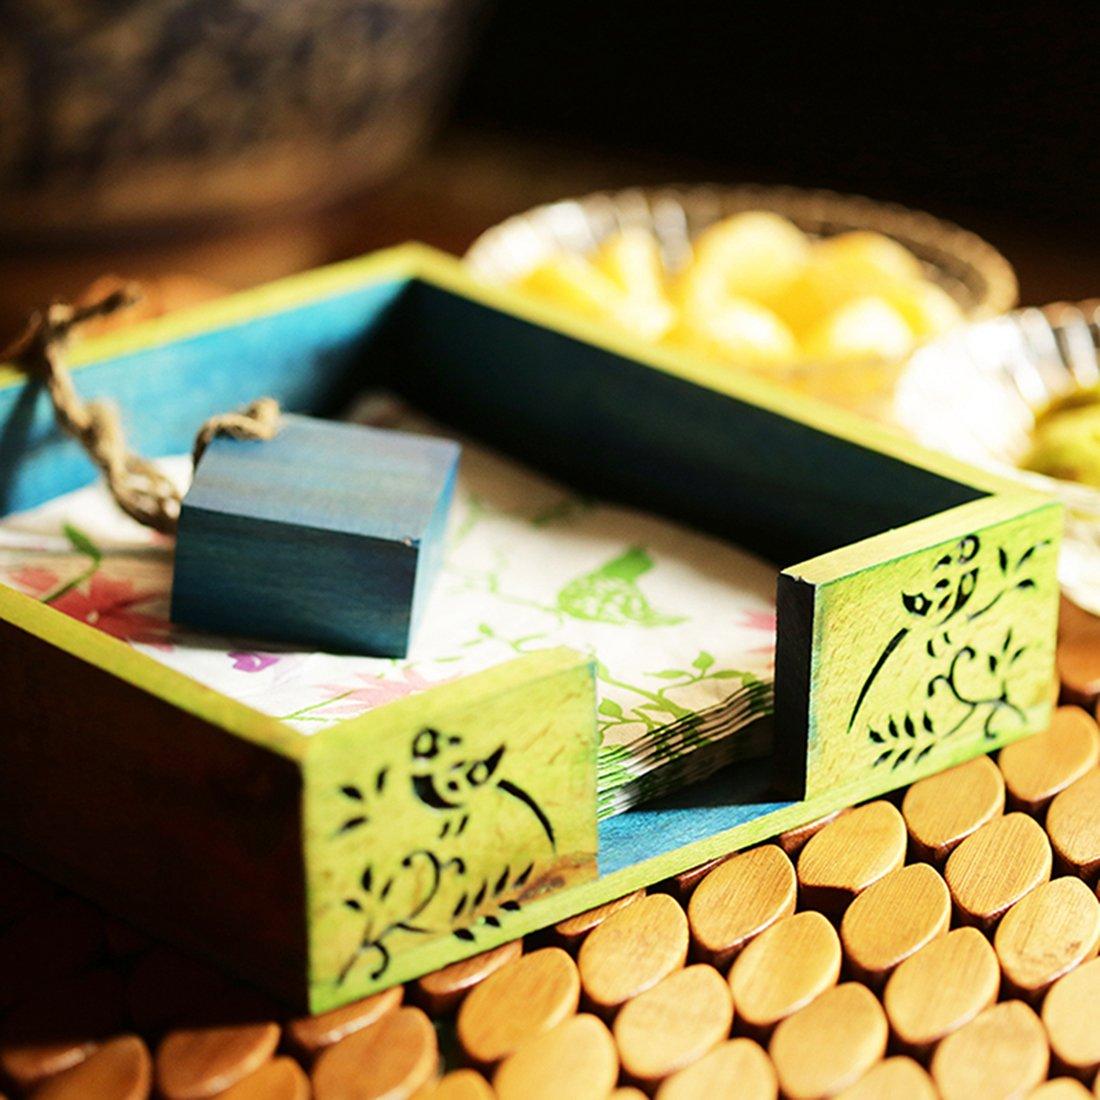 ExclusiveLane Wooden Floral Leaf Design Napkin Holder -Napkin Rings Holder For Kitchen Table Tissue Paper Holder Stand For Table Top